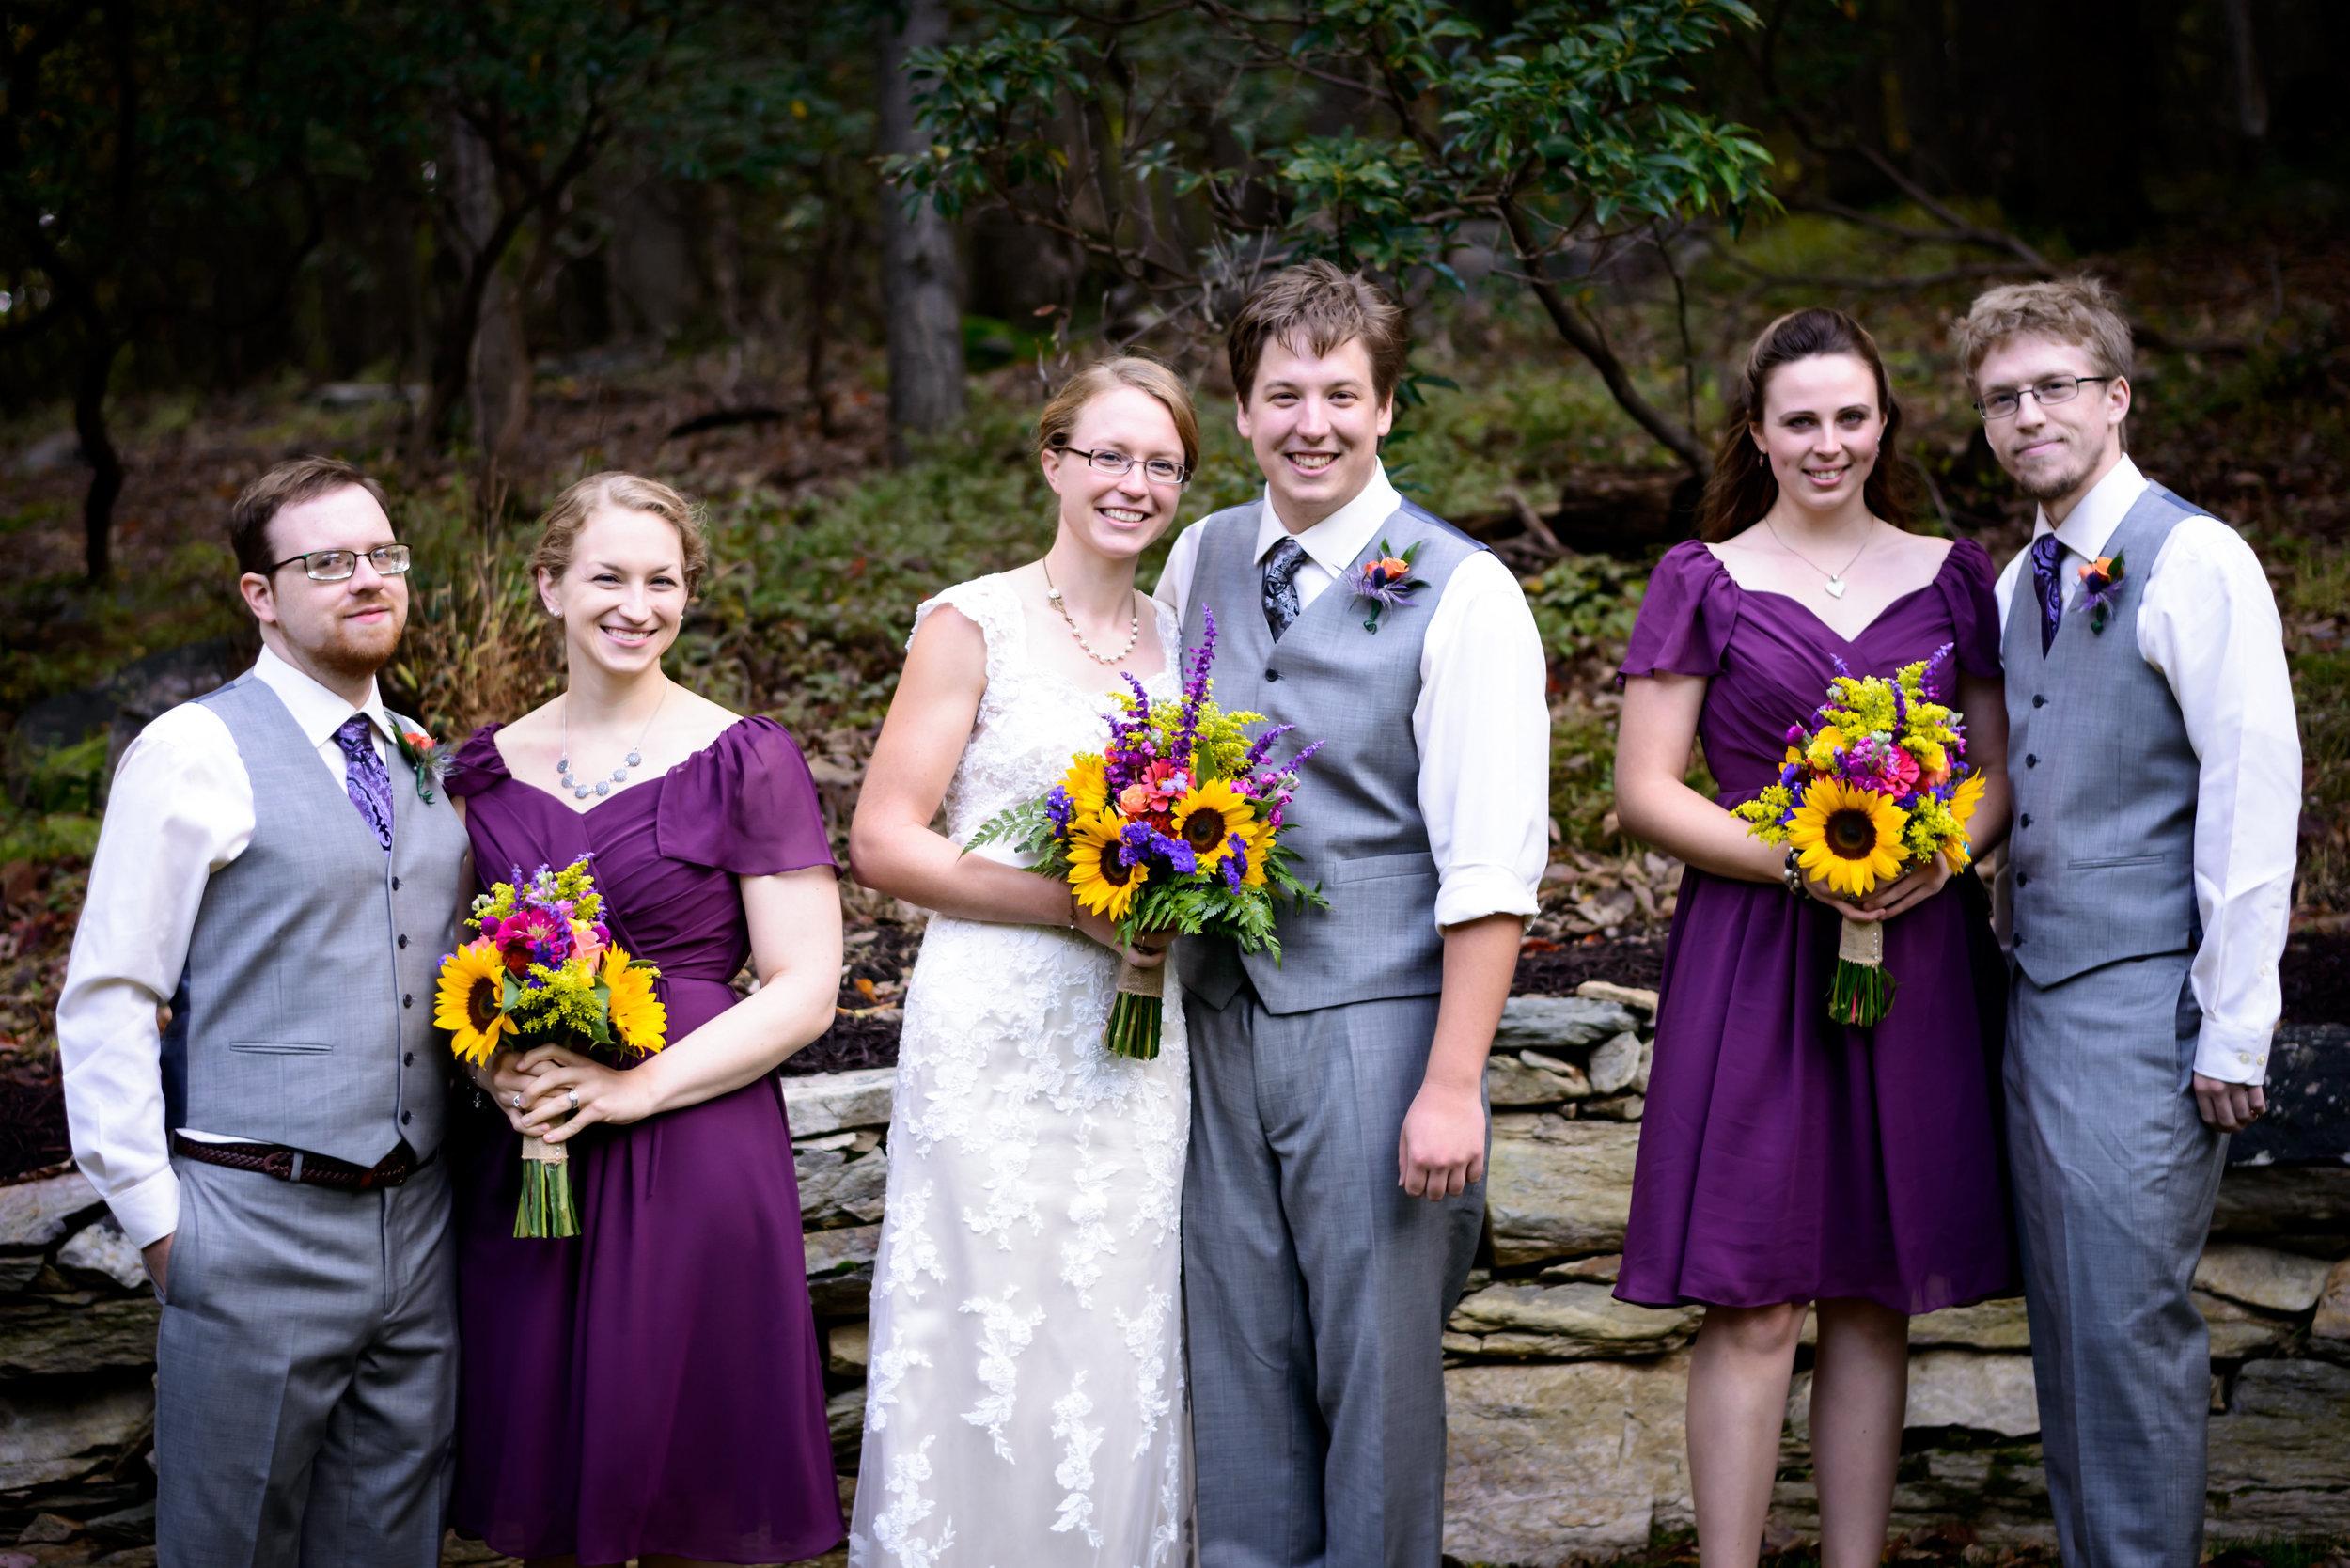 Robinson Luttrell Wedding 10 4 14-Bridal Family Photos-0119.jpg